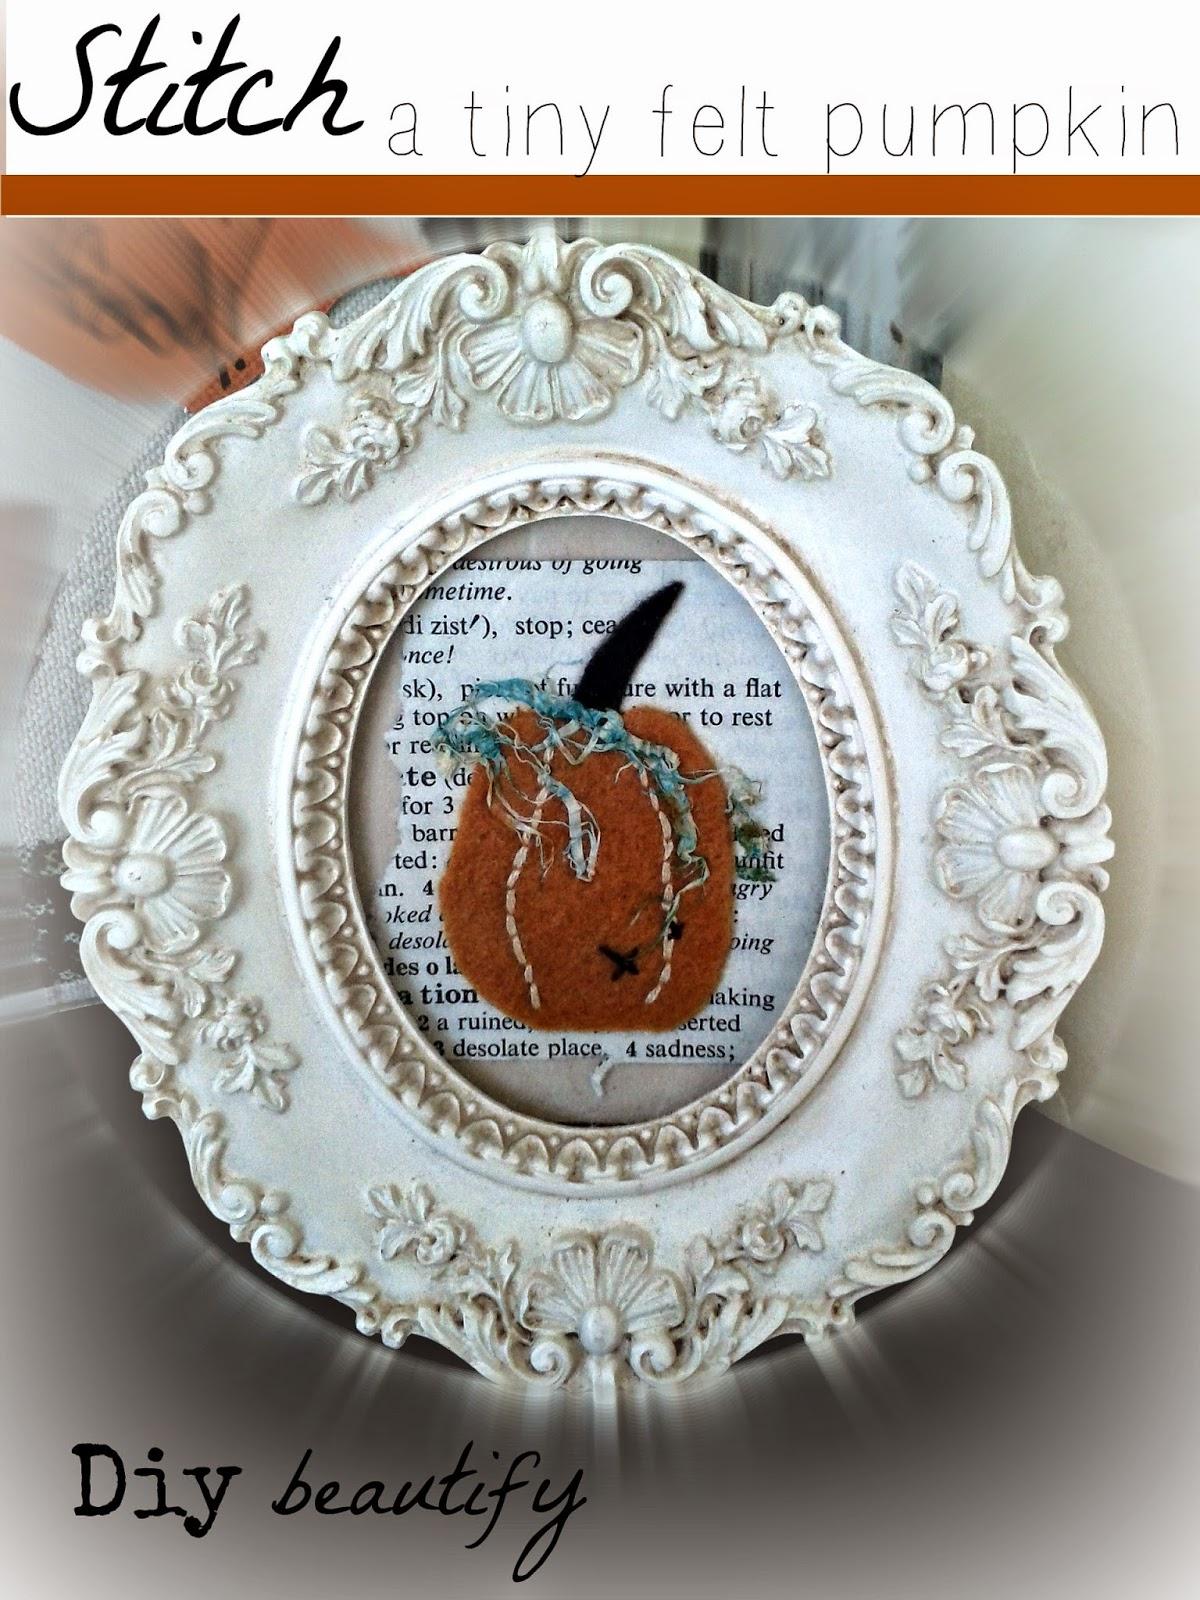 Stitch and frame a tiny pumpkin www.diybeautify.com